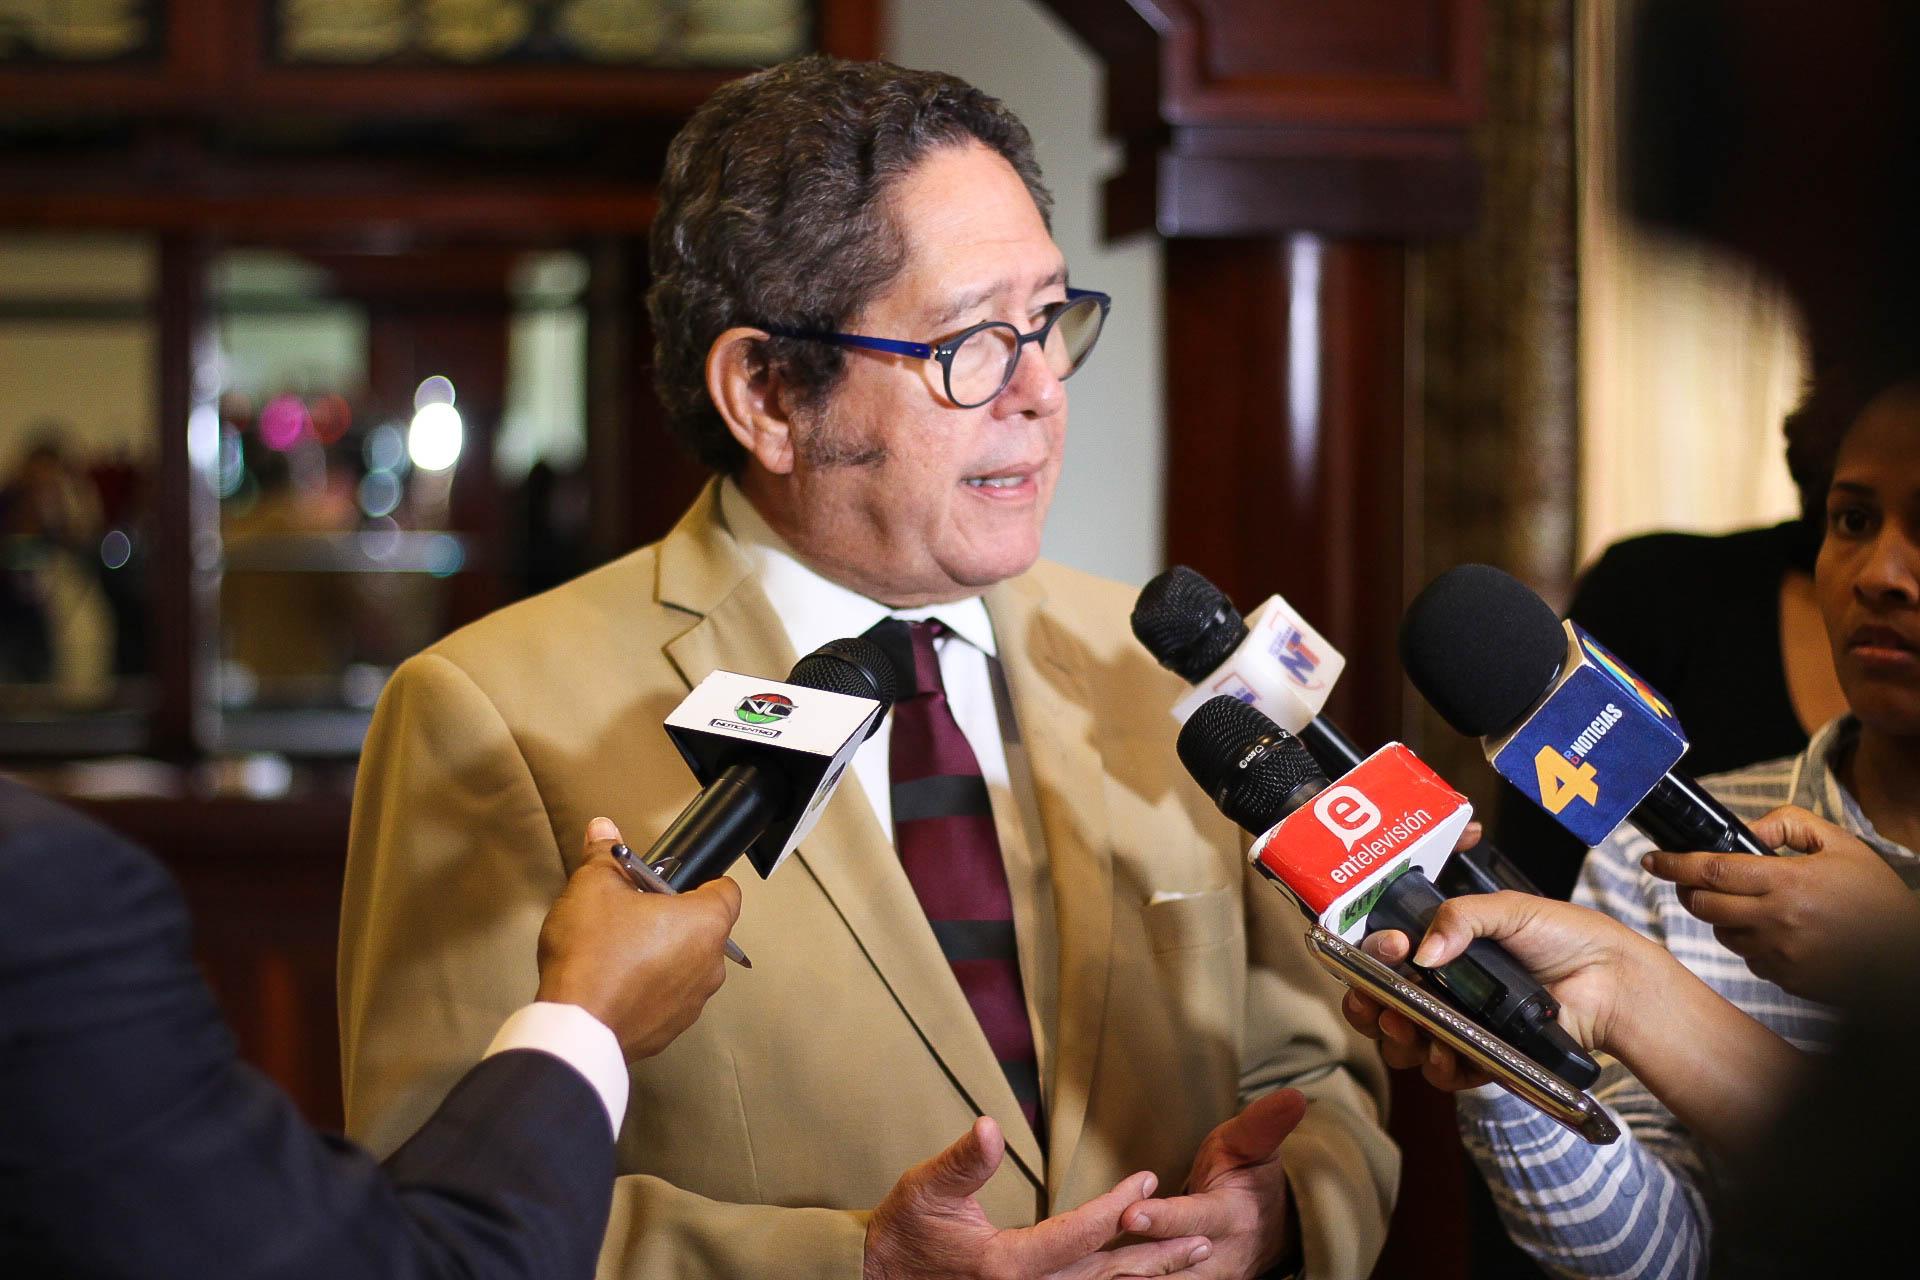 foto 2, fernando gonzález nicolás, presidente mesa mancomunidad en rd. (2)